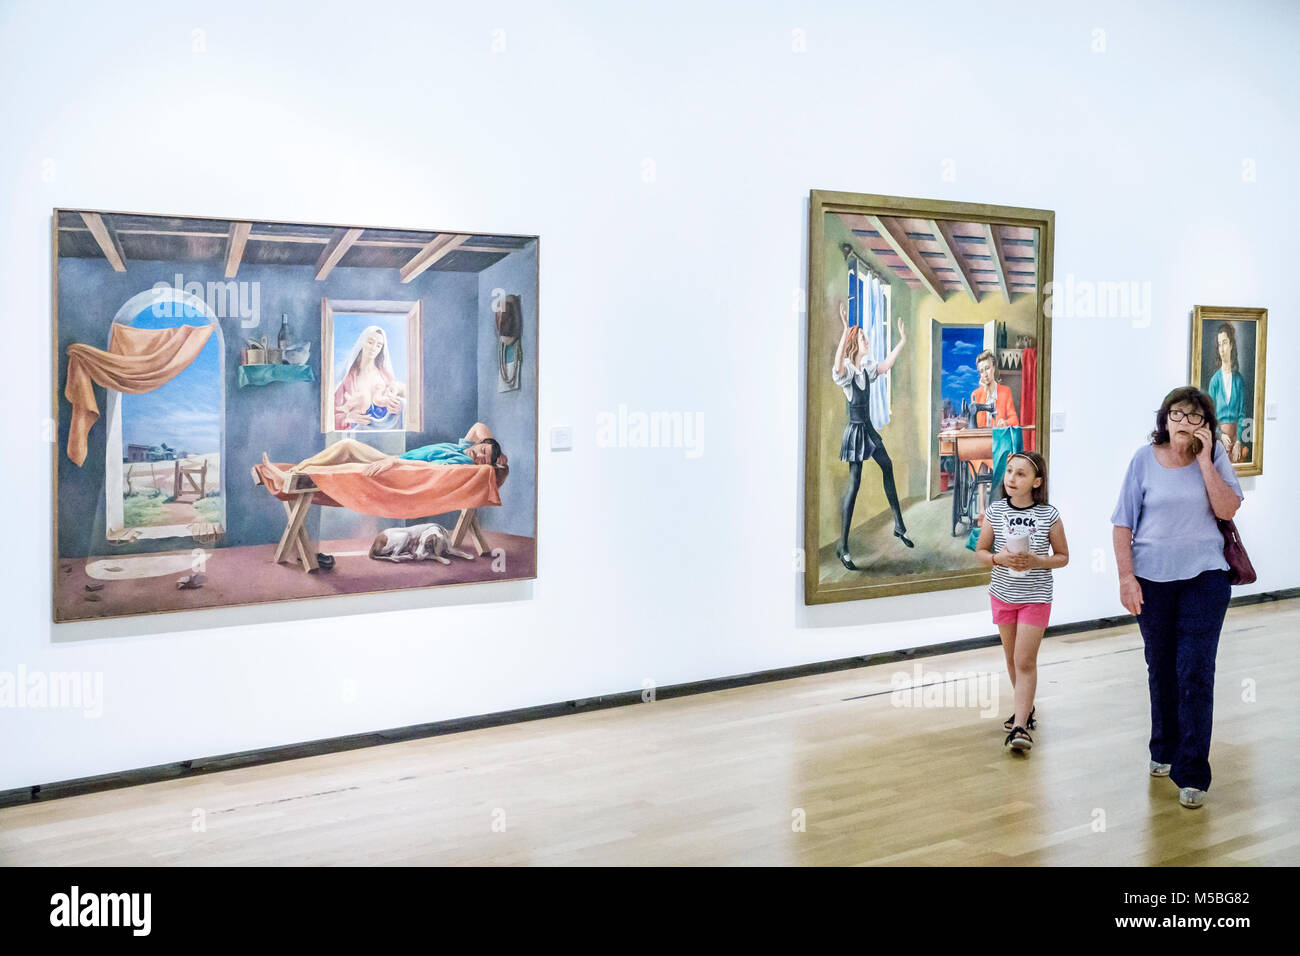 Buenos Aires Argentina Recoleta Museo Nacional de Bellas Artes National Museum of Fine Arts interior gallery paintings - Stock Image